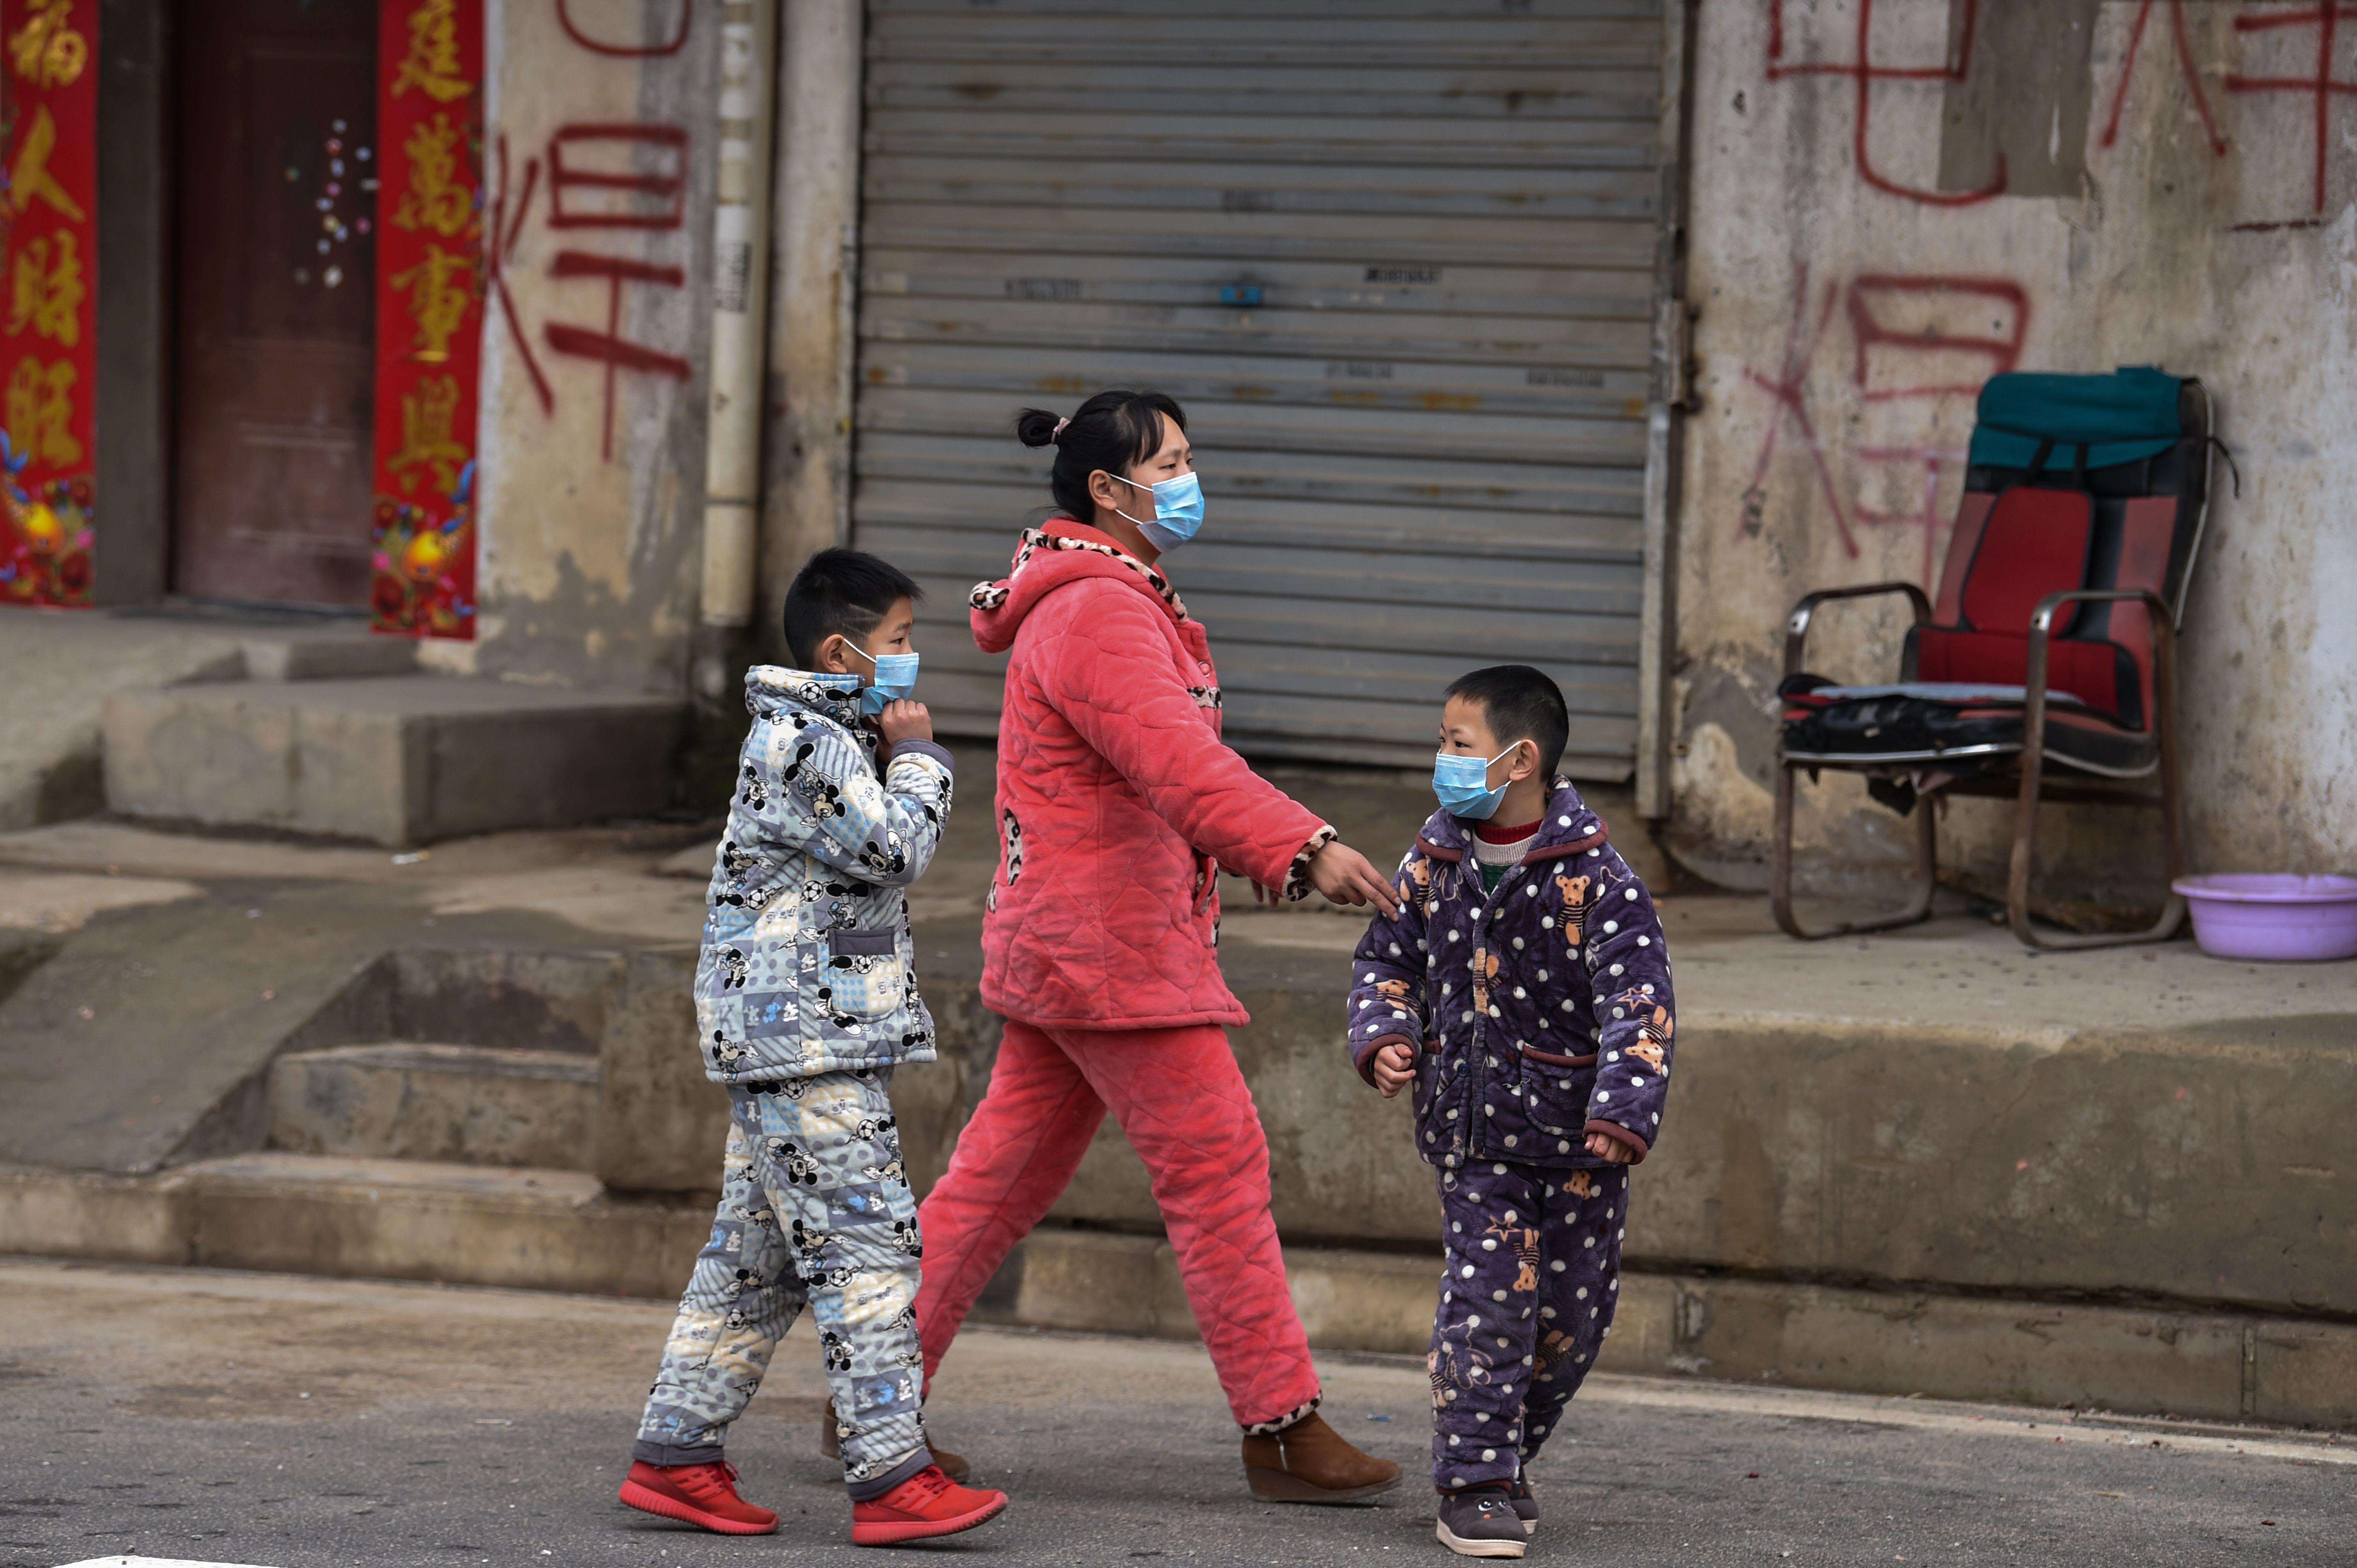 Did China downplay the coronavirus outbreak early on?